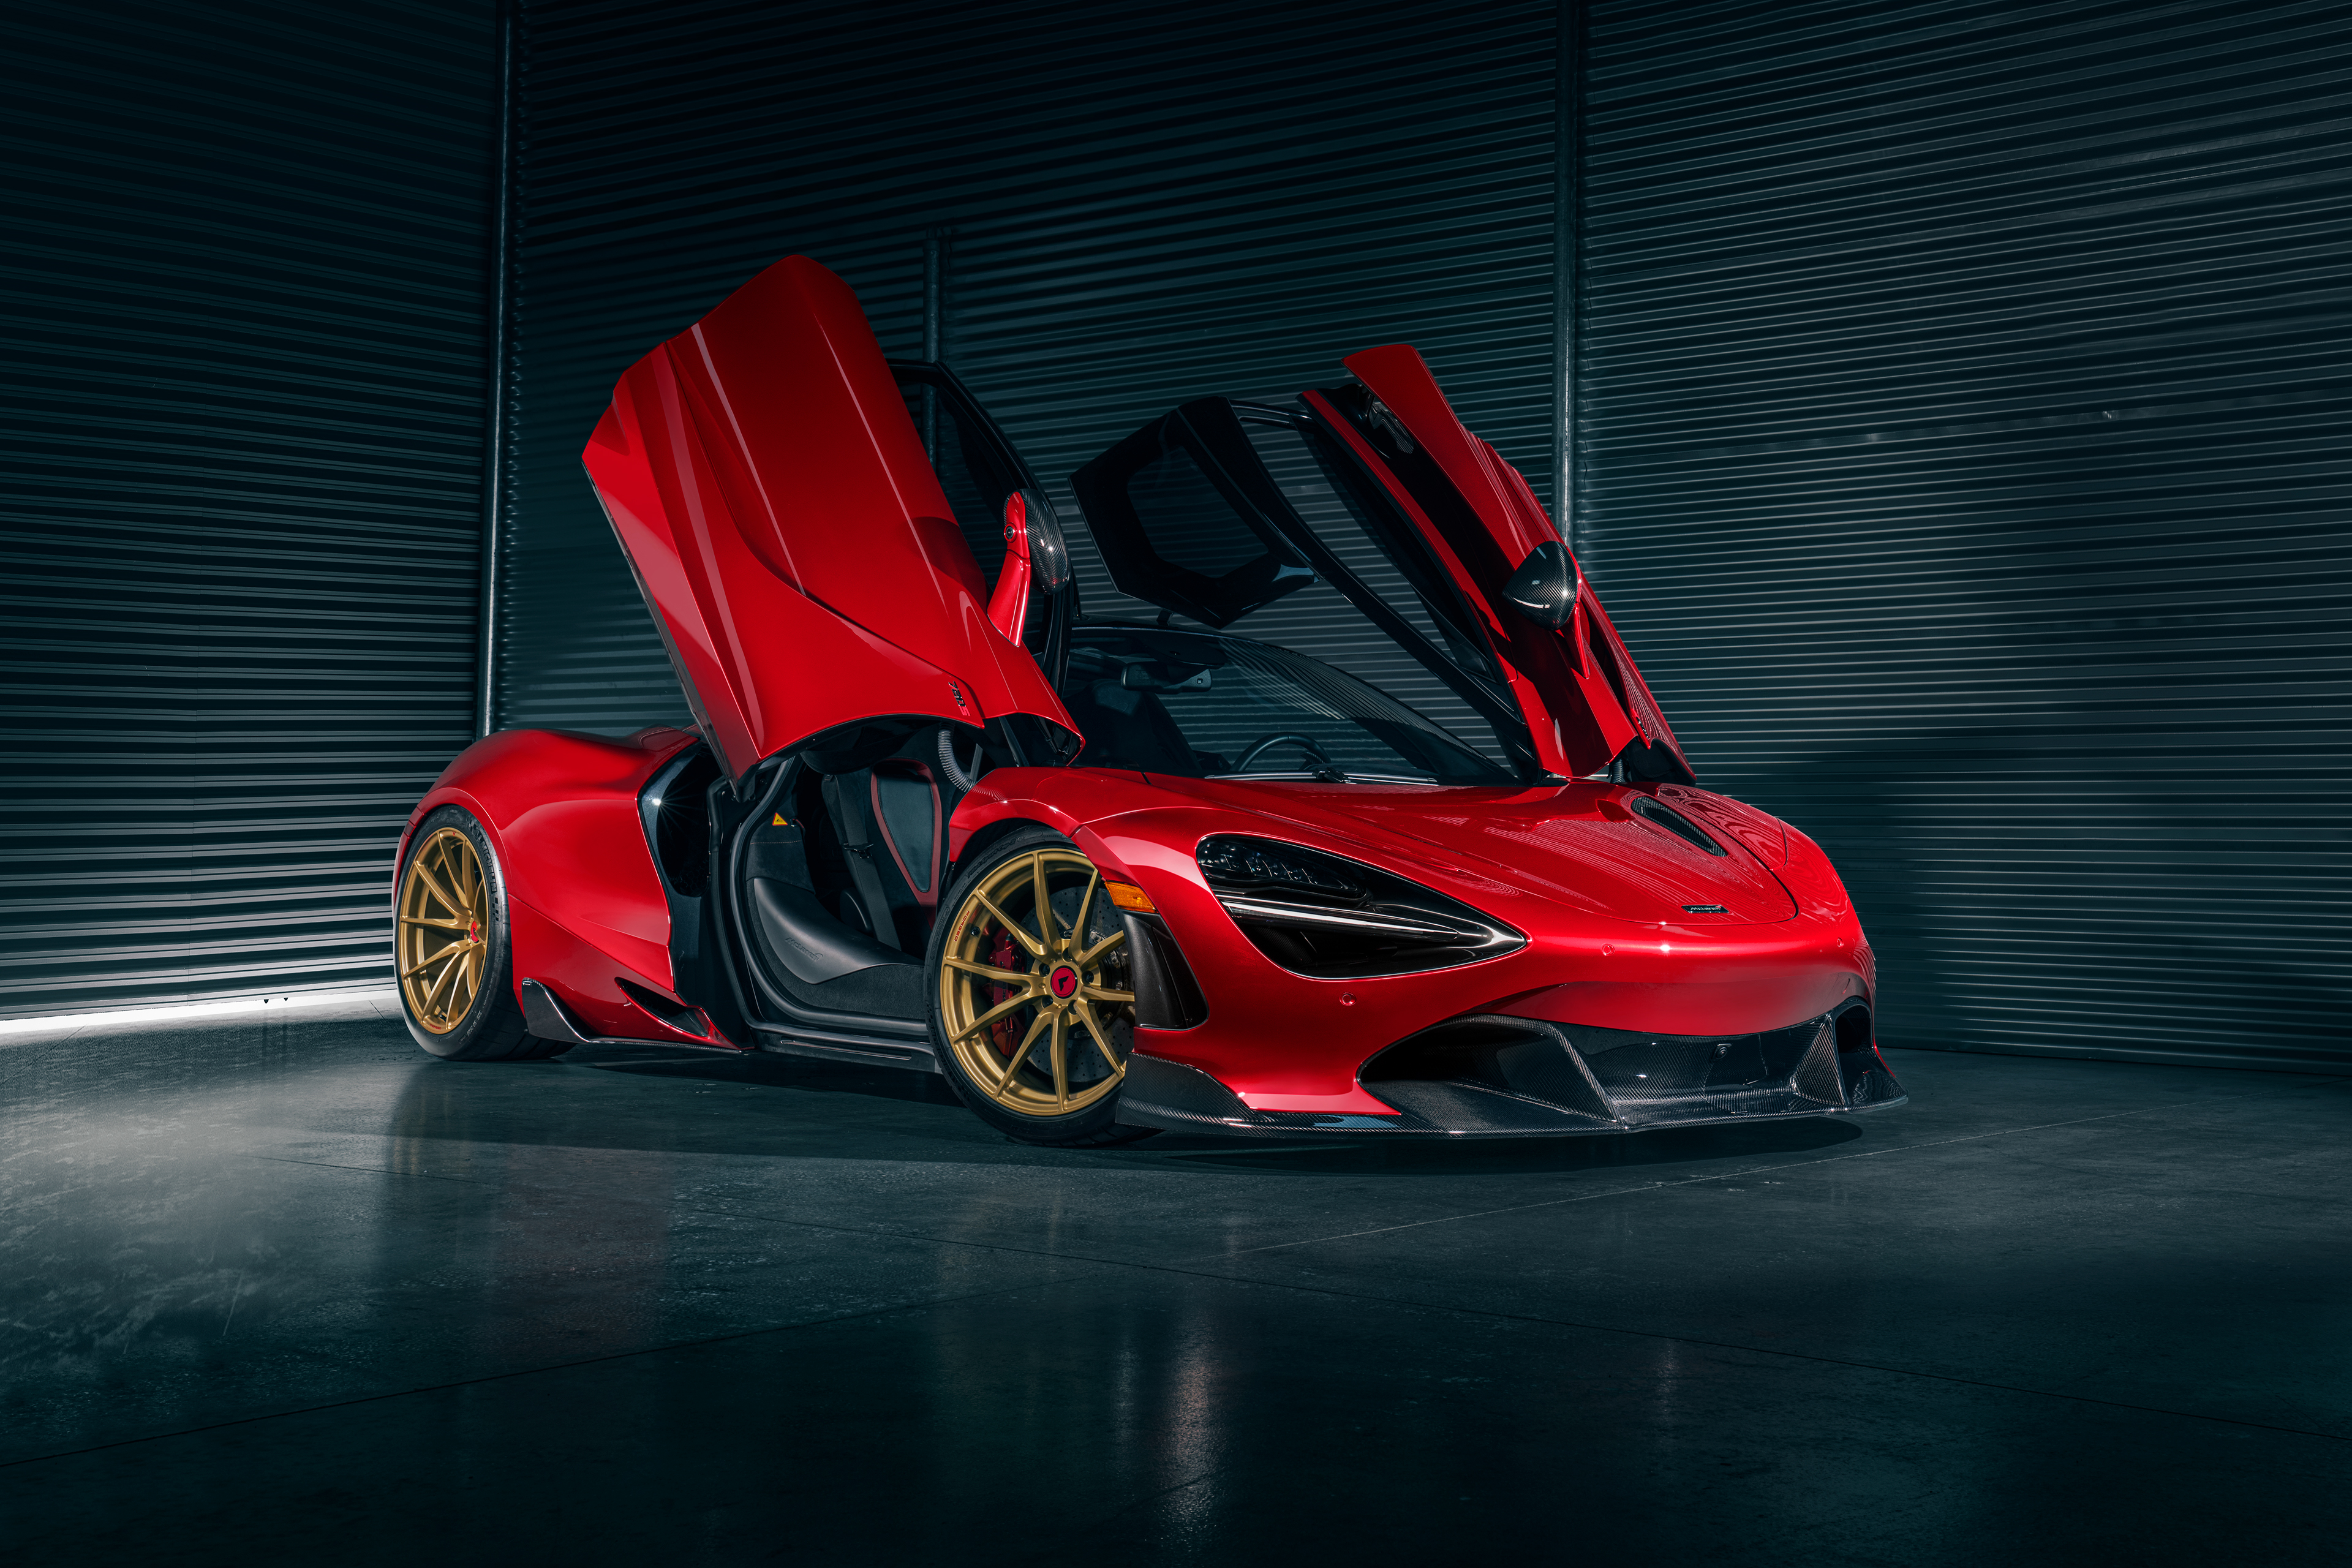 mclaren 720s vorsteiner 2020 4k 1608910352 1 - McLaren 720s Vorsteiner 2020 4k - McLaren 720s Vorsteiner 2020 4k wallpapers